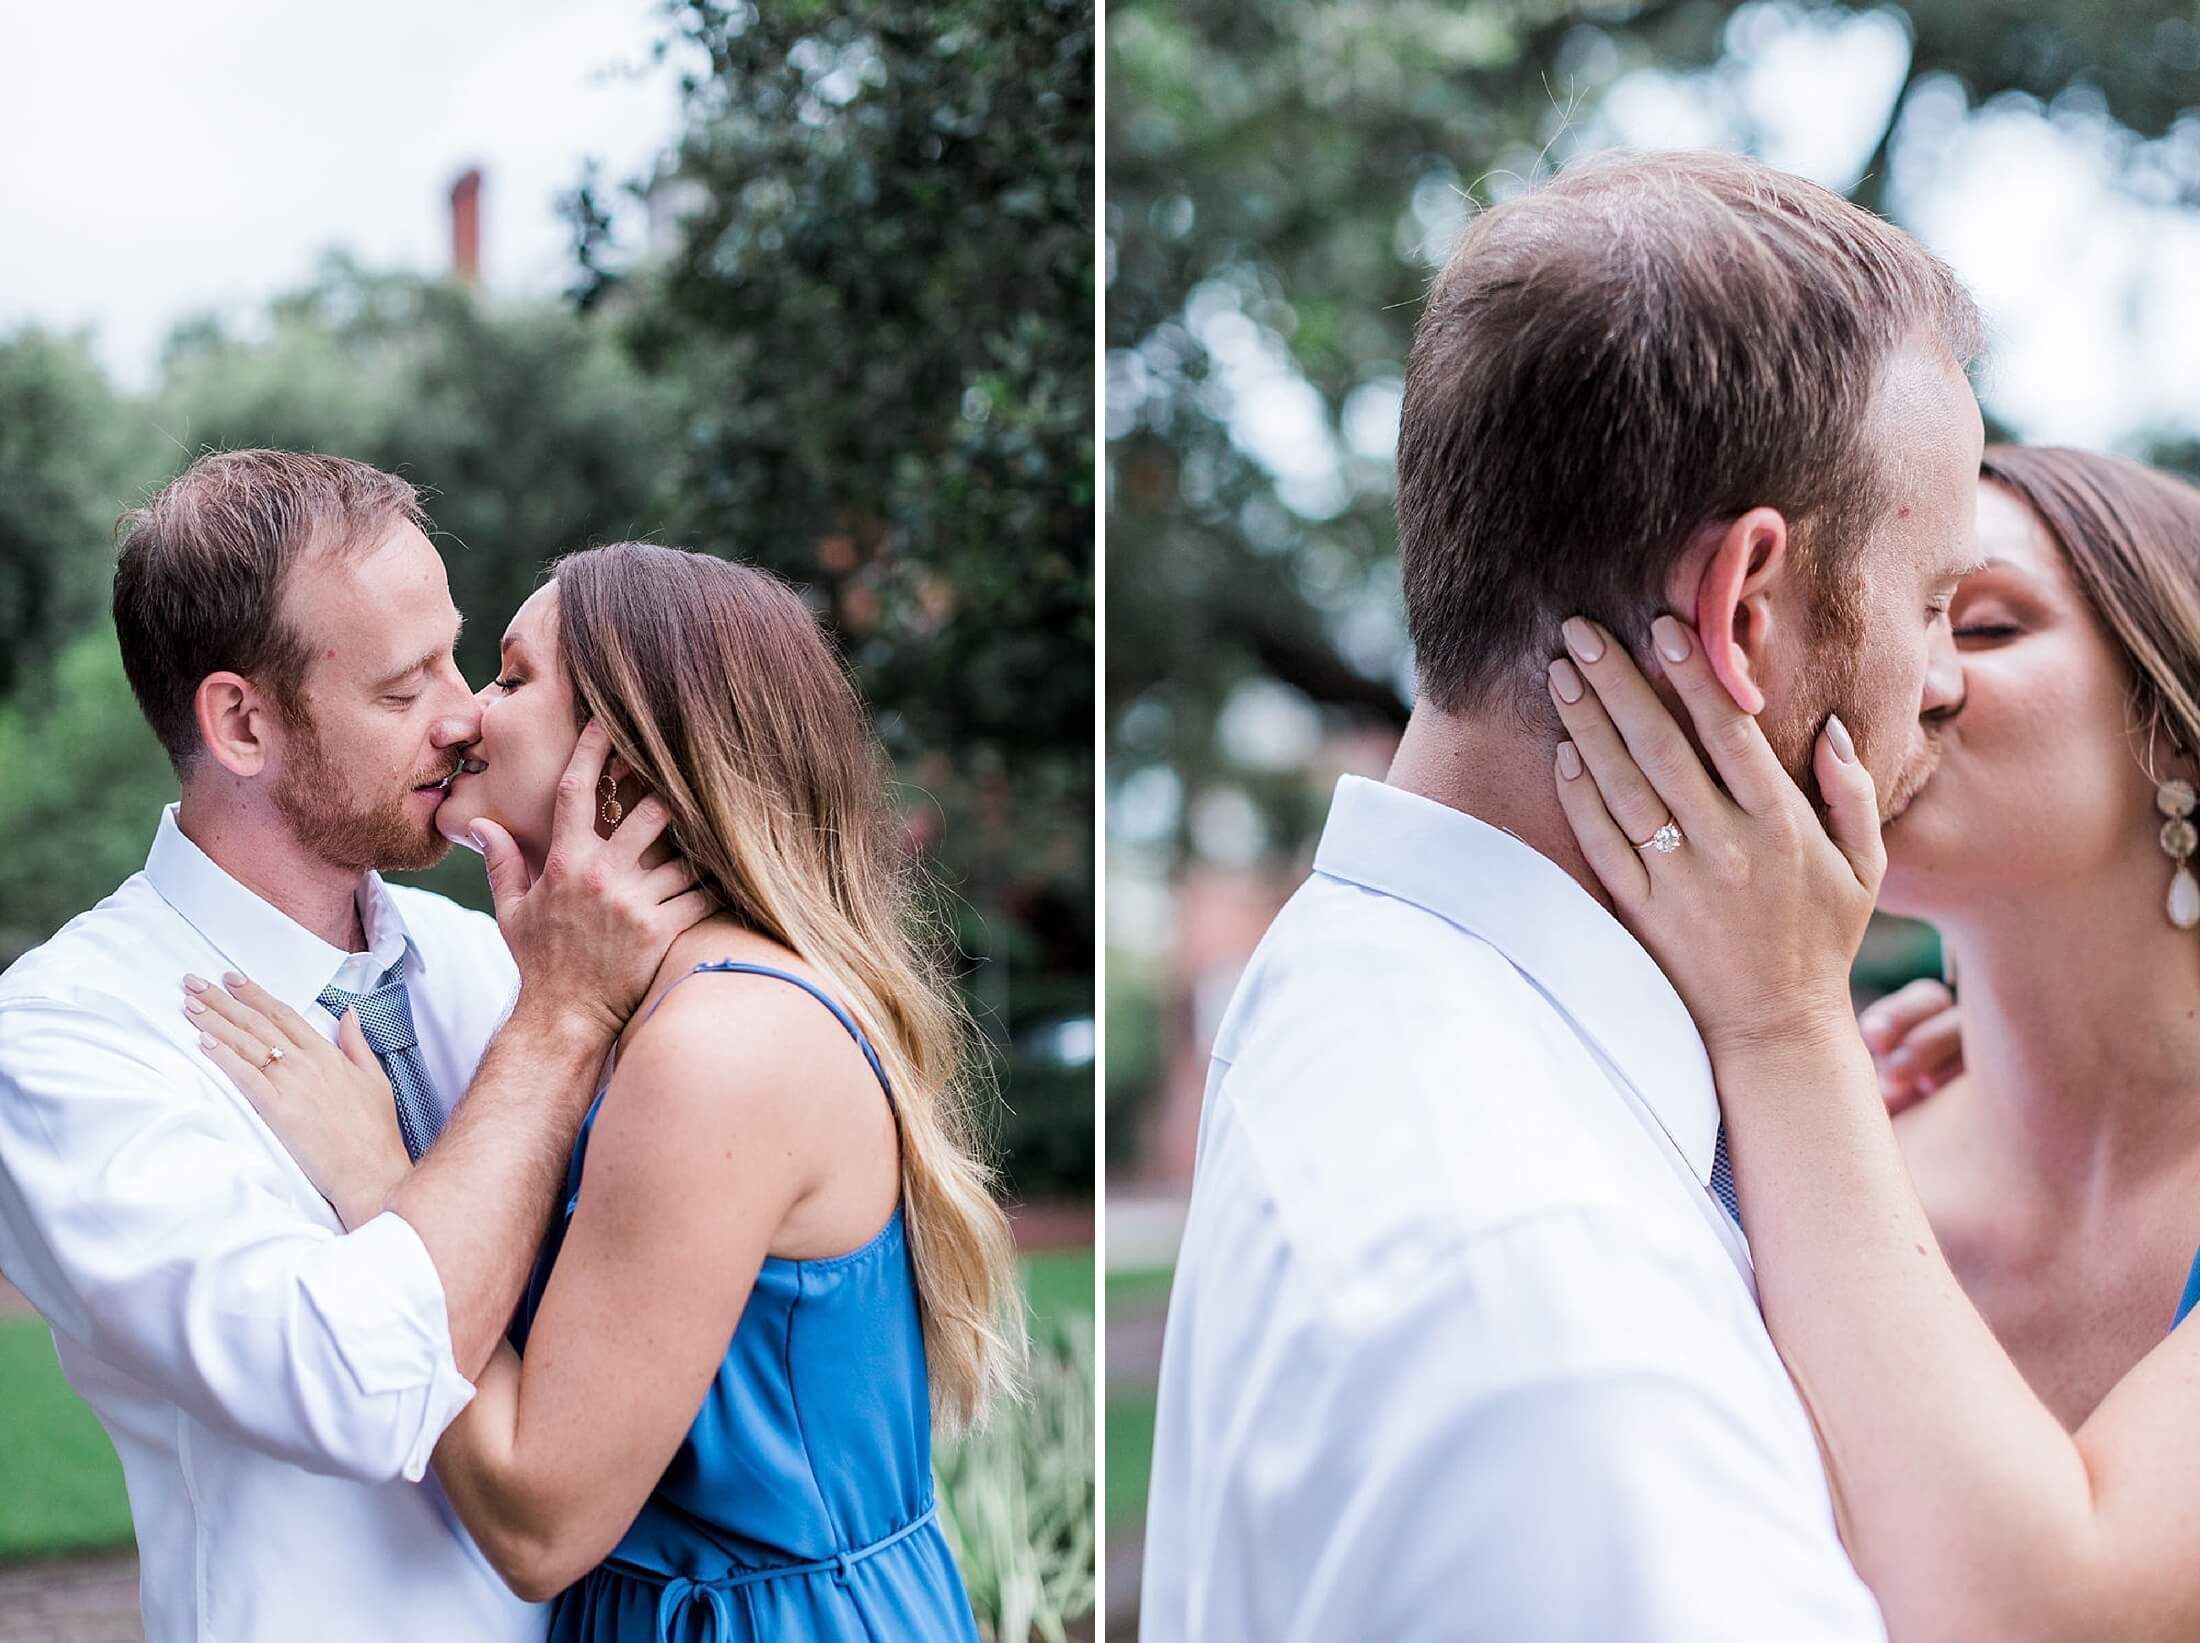 Apt-b-photography-savannah-proposal-photographer-savannah-wedding-photographer-11.jpg